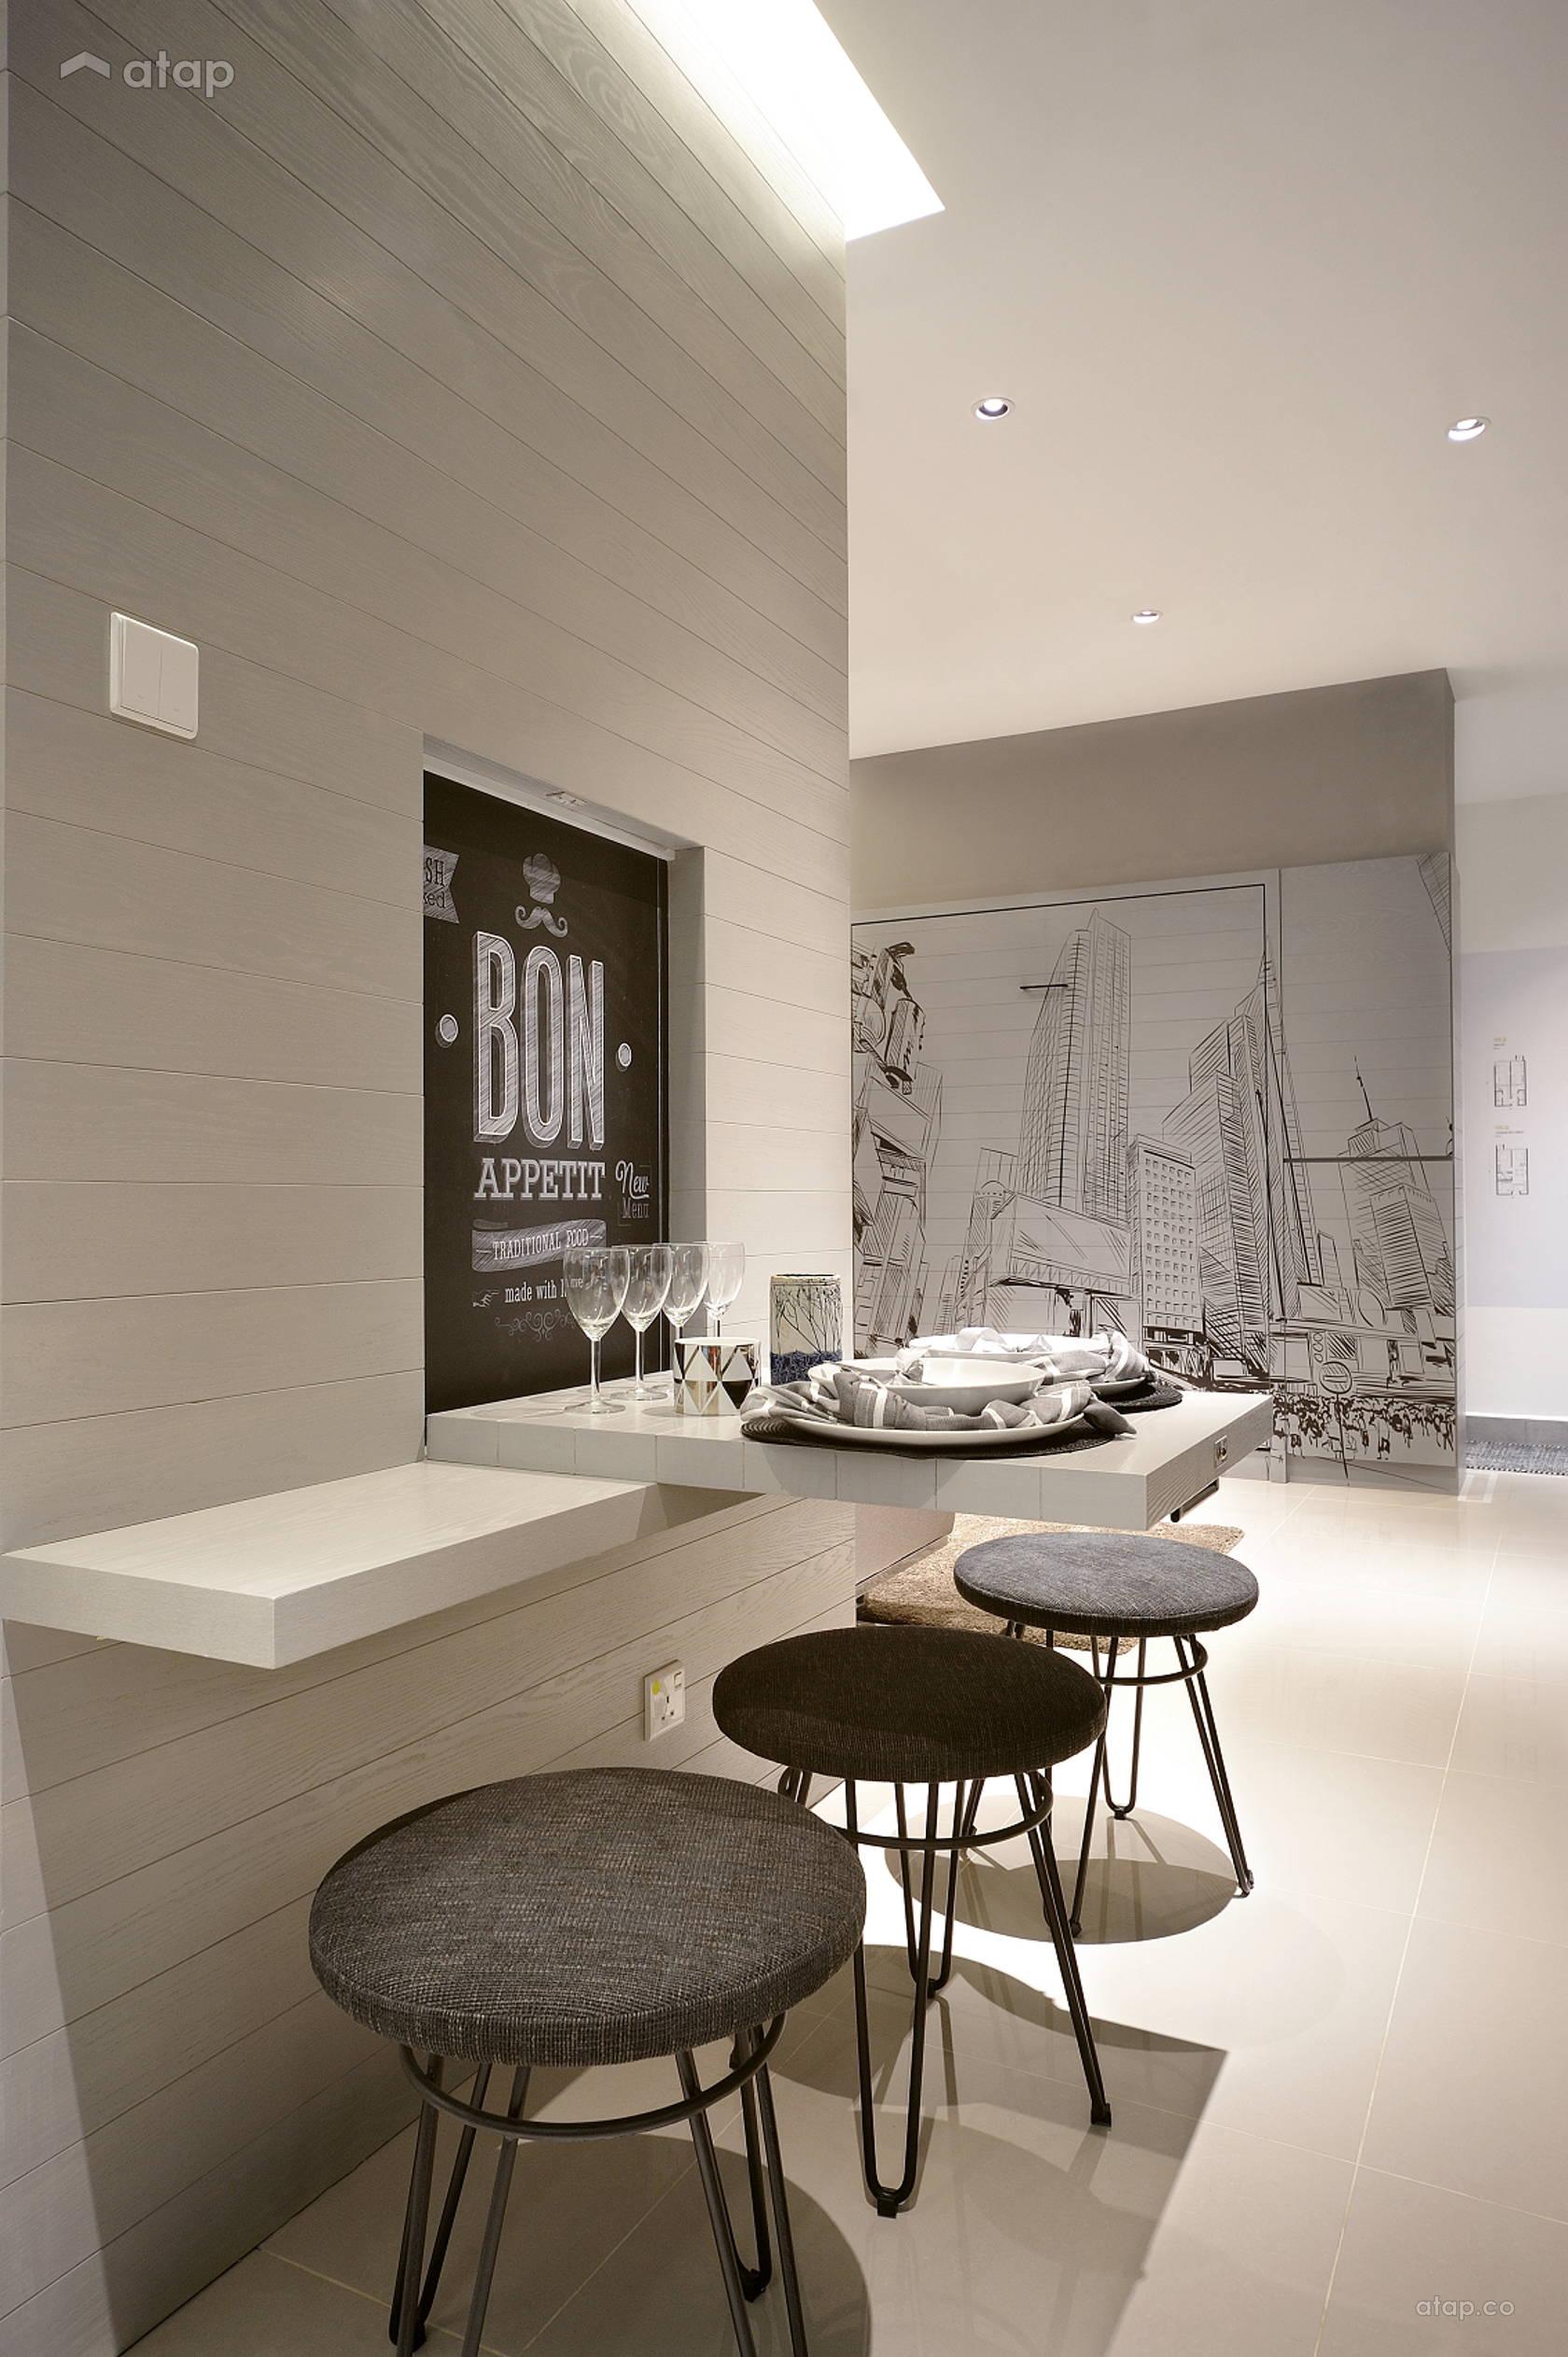 highpark studio a1 interior design renovation ideas photos and 1 8